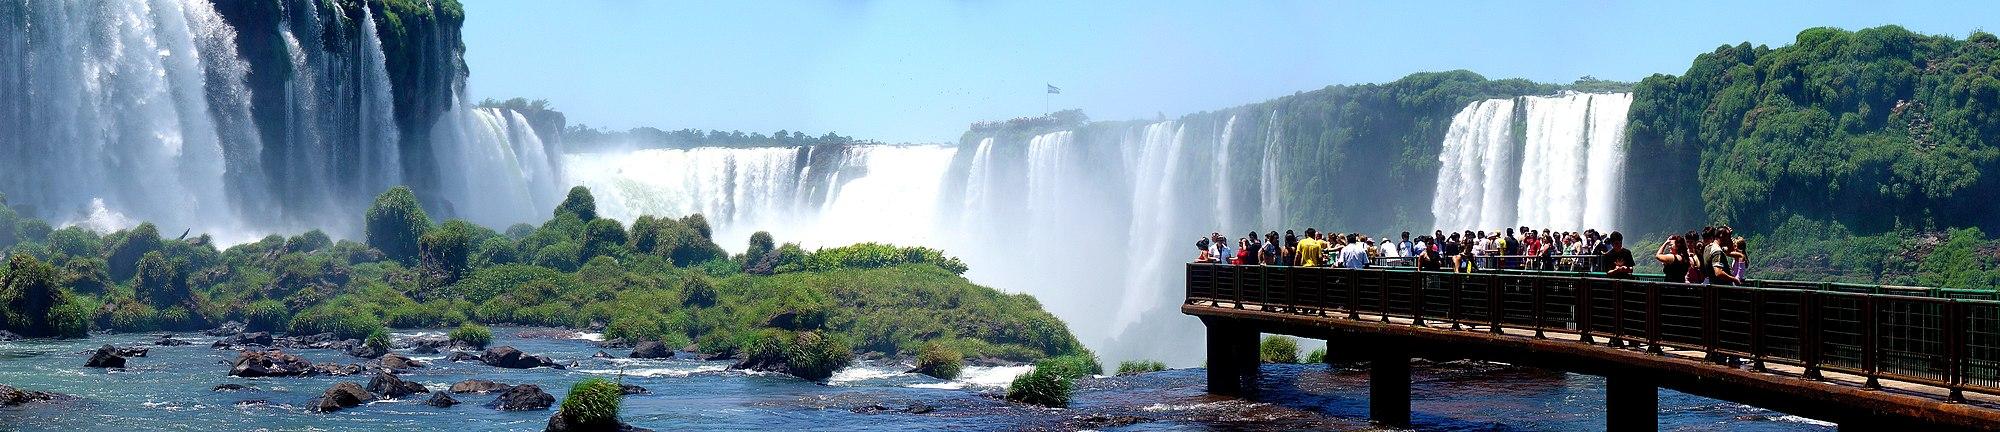 Iguazu Décembre 2007 - Panorama 7.jpg